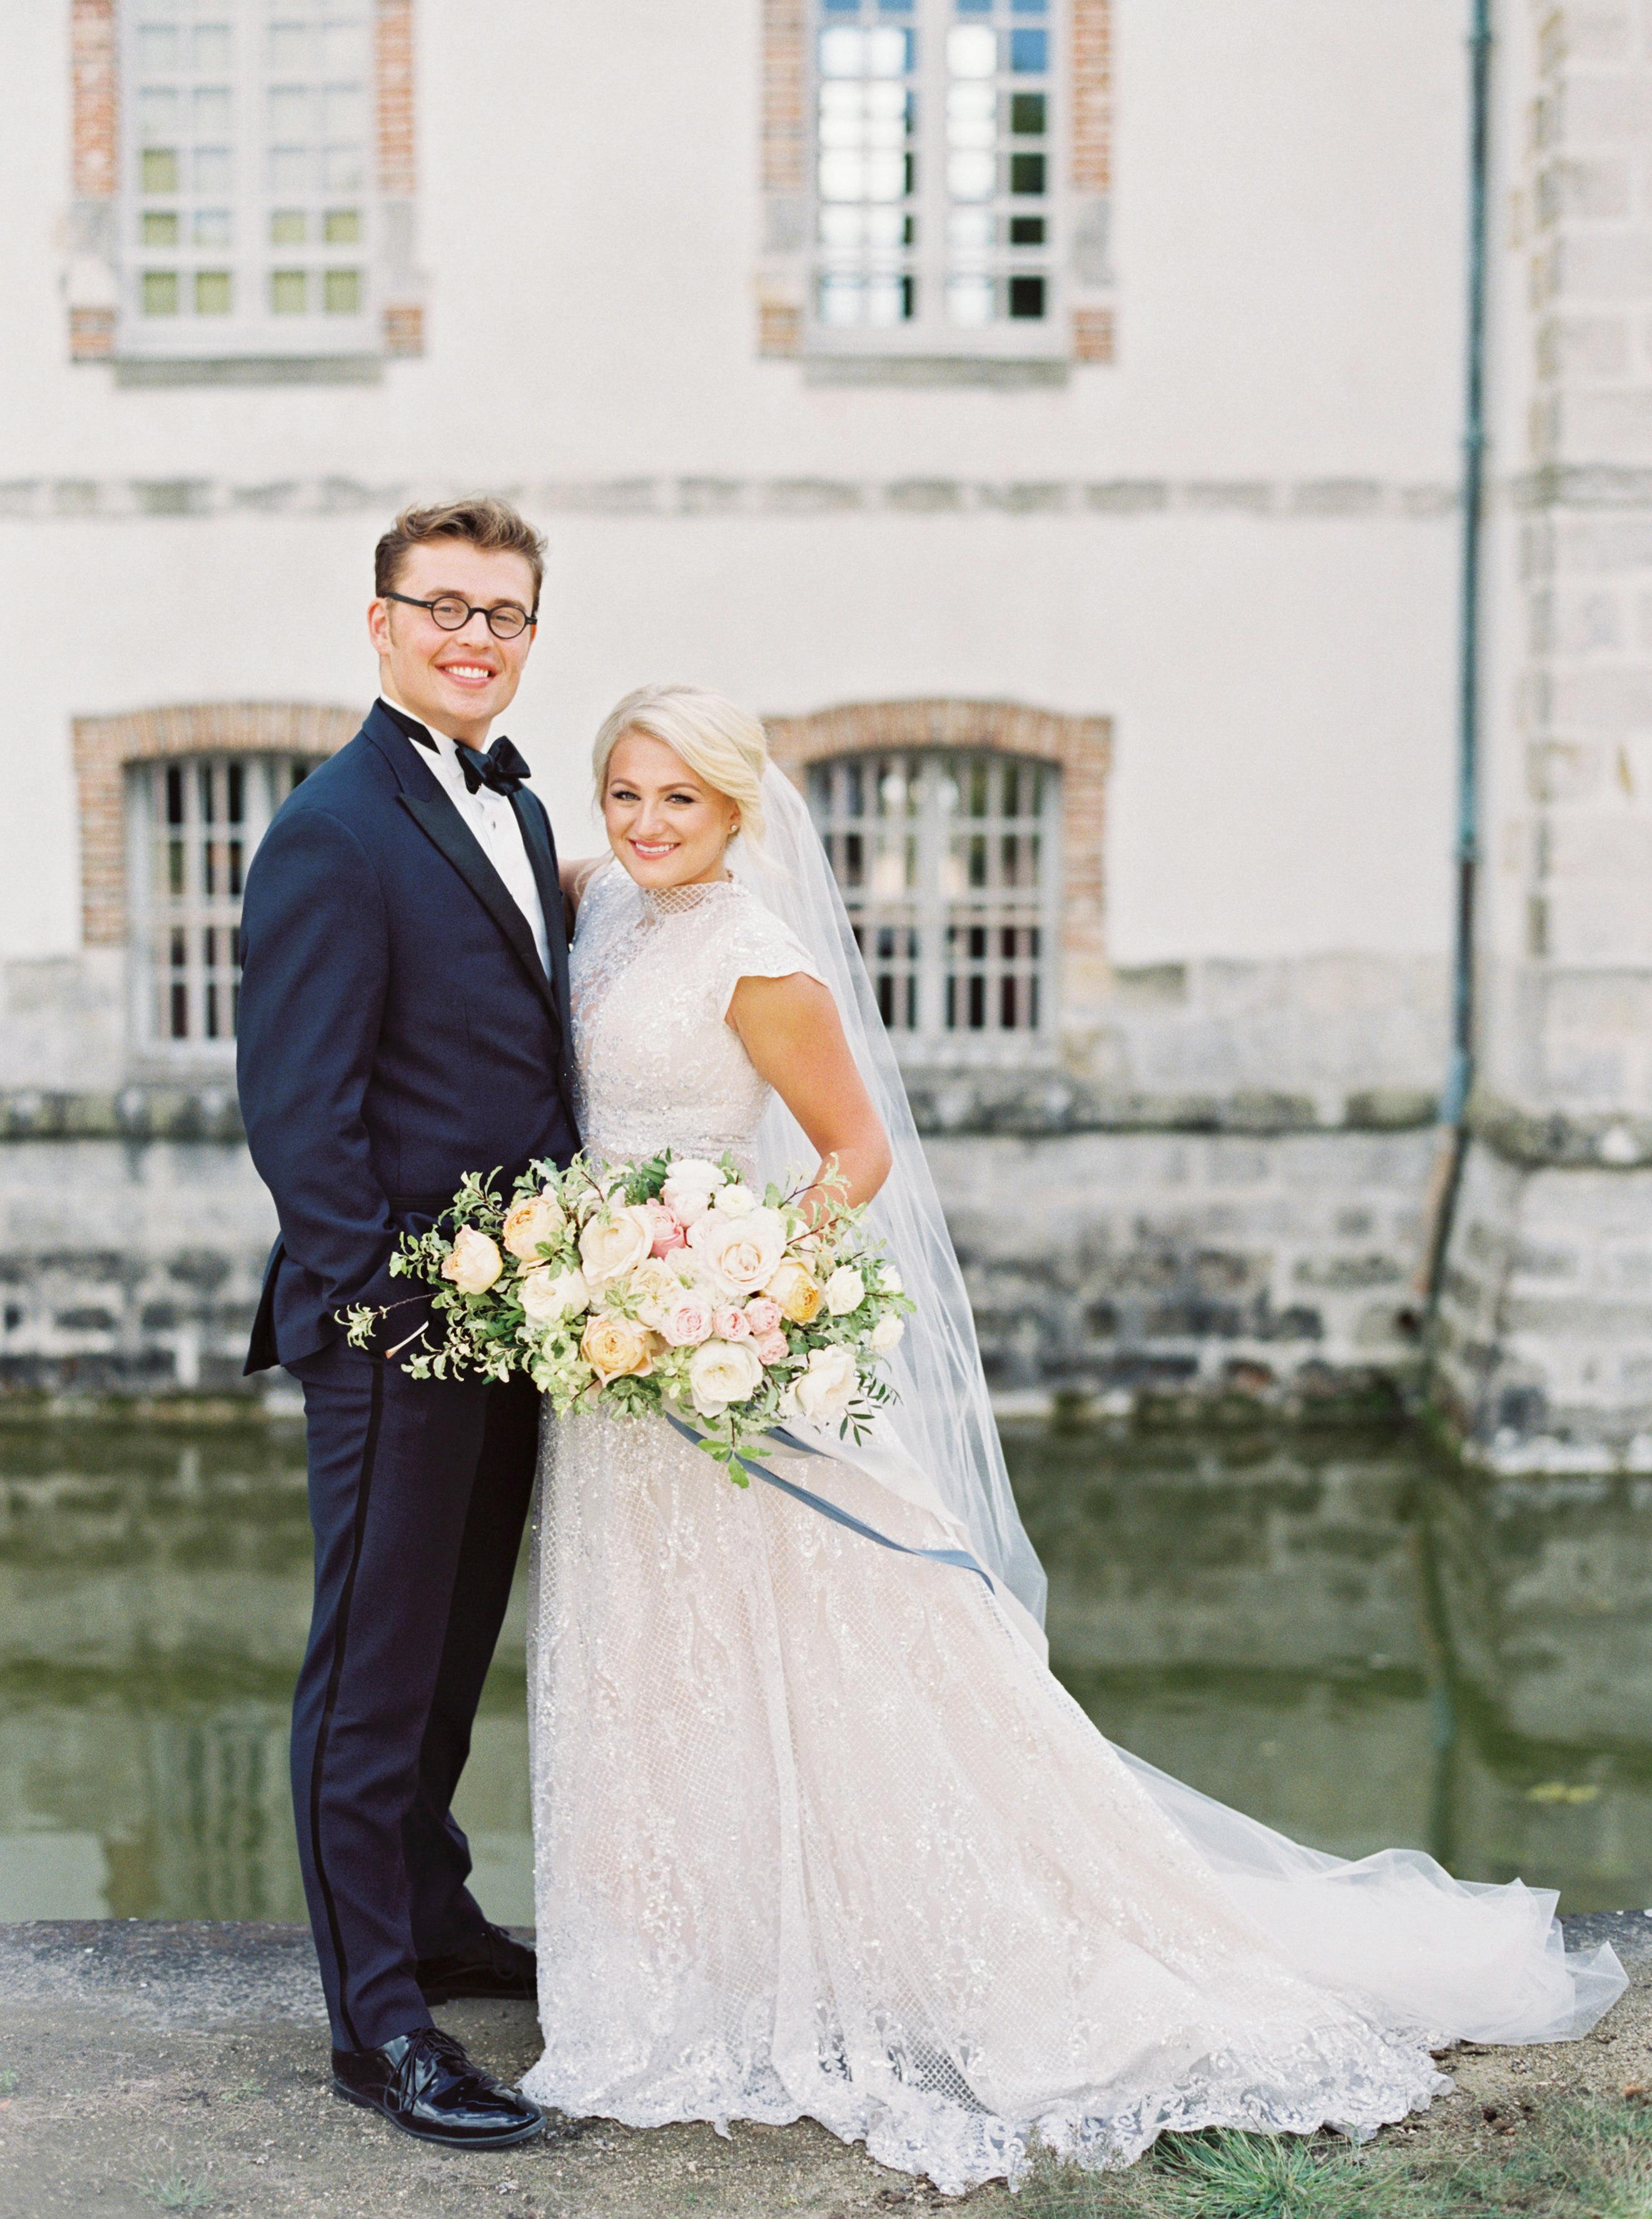 rachael cameron wedding couple with bouquet